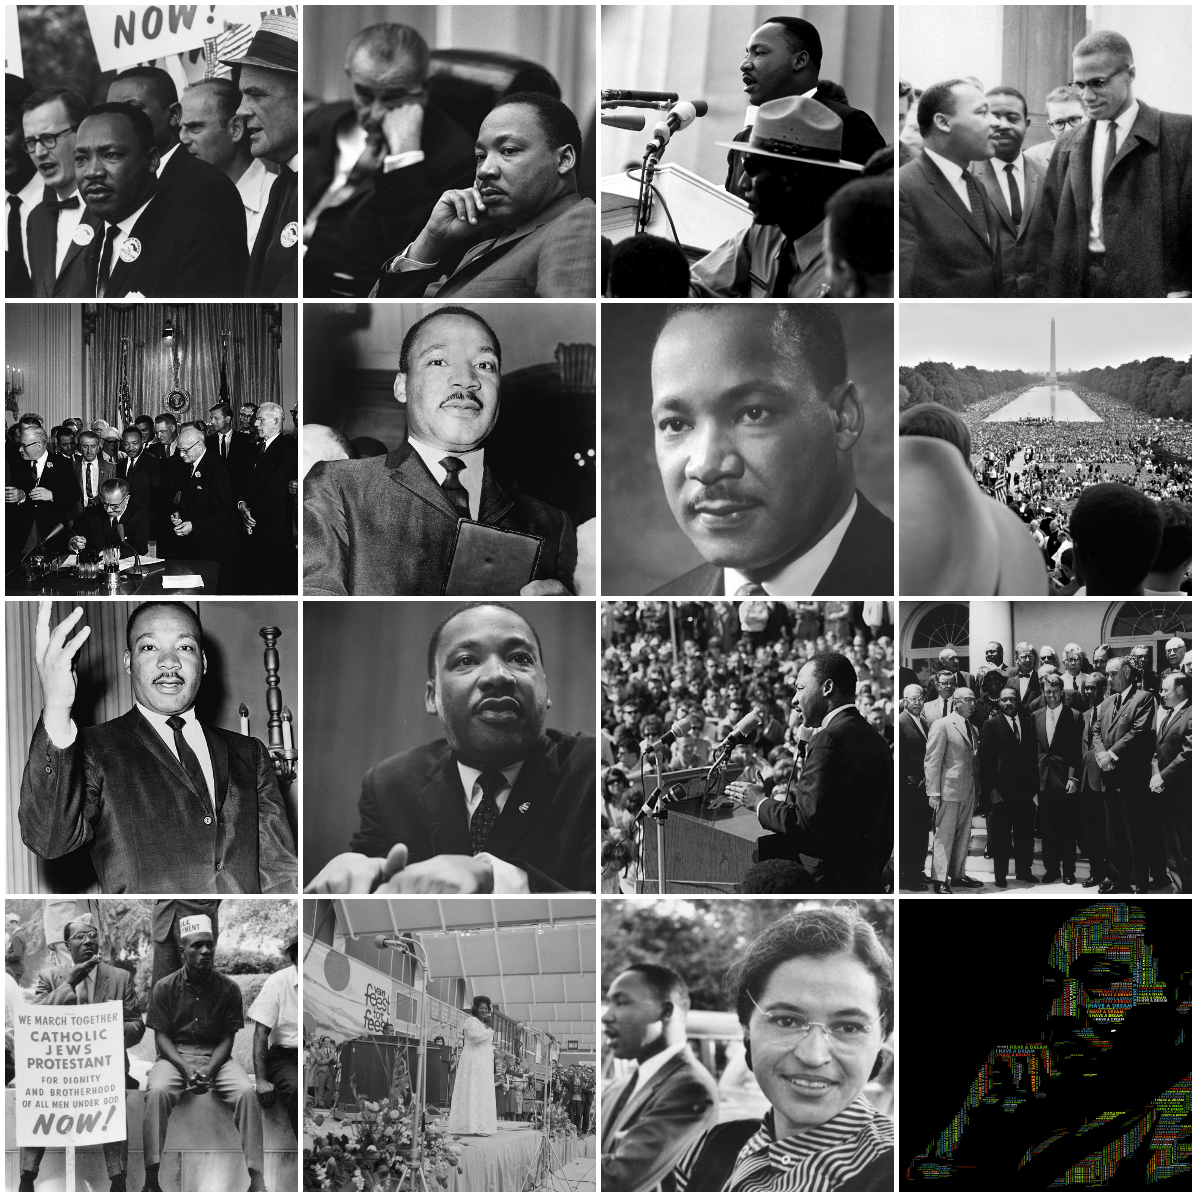 Motivation Mondays: Silence Is Betrayal - #MLKDAY